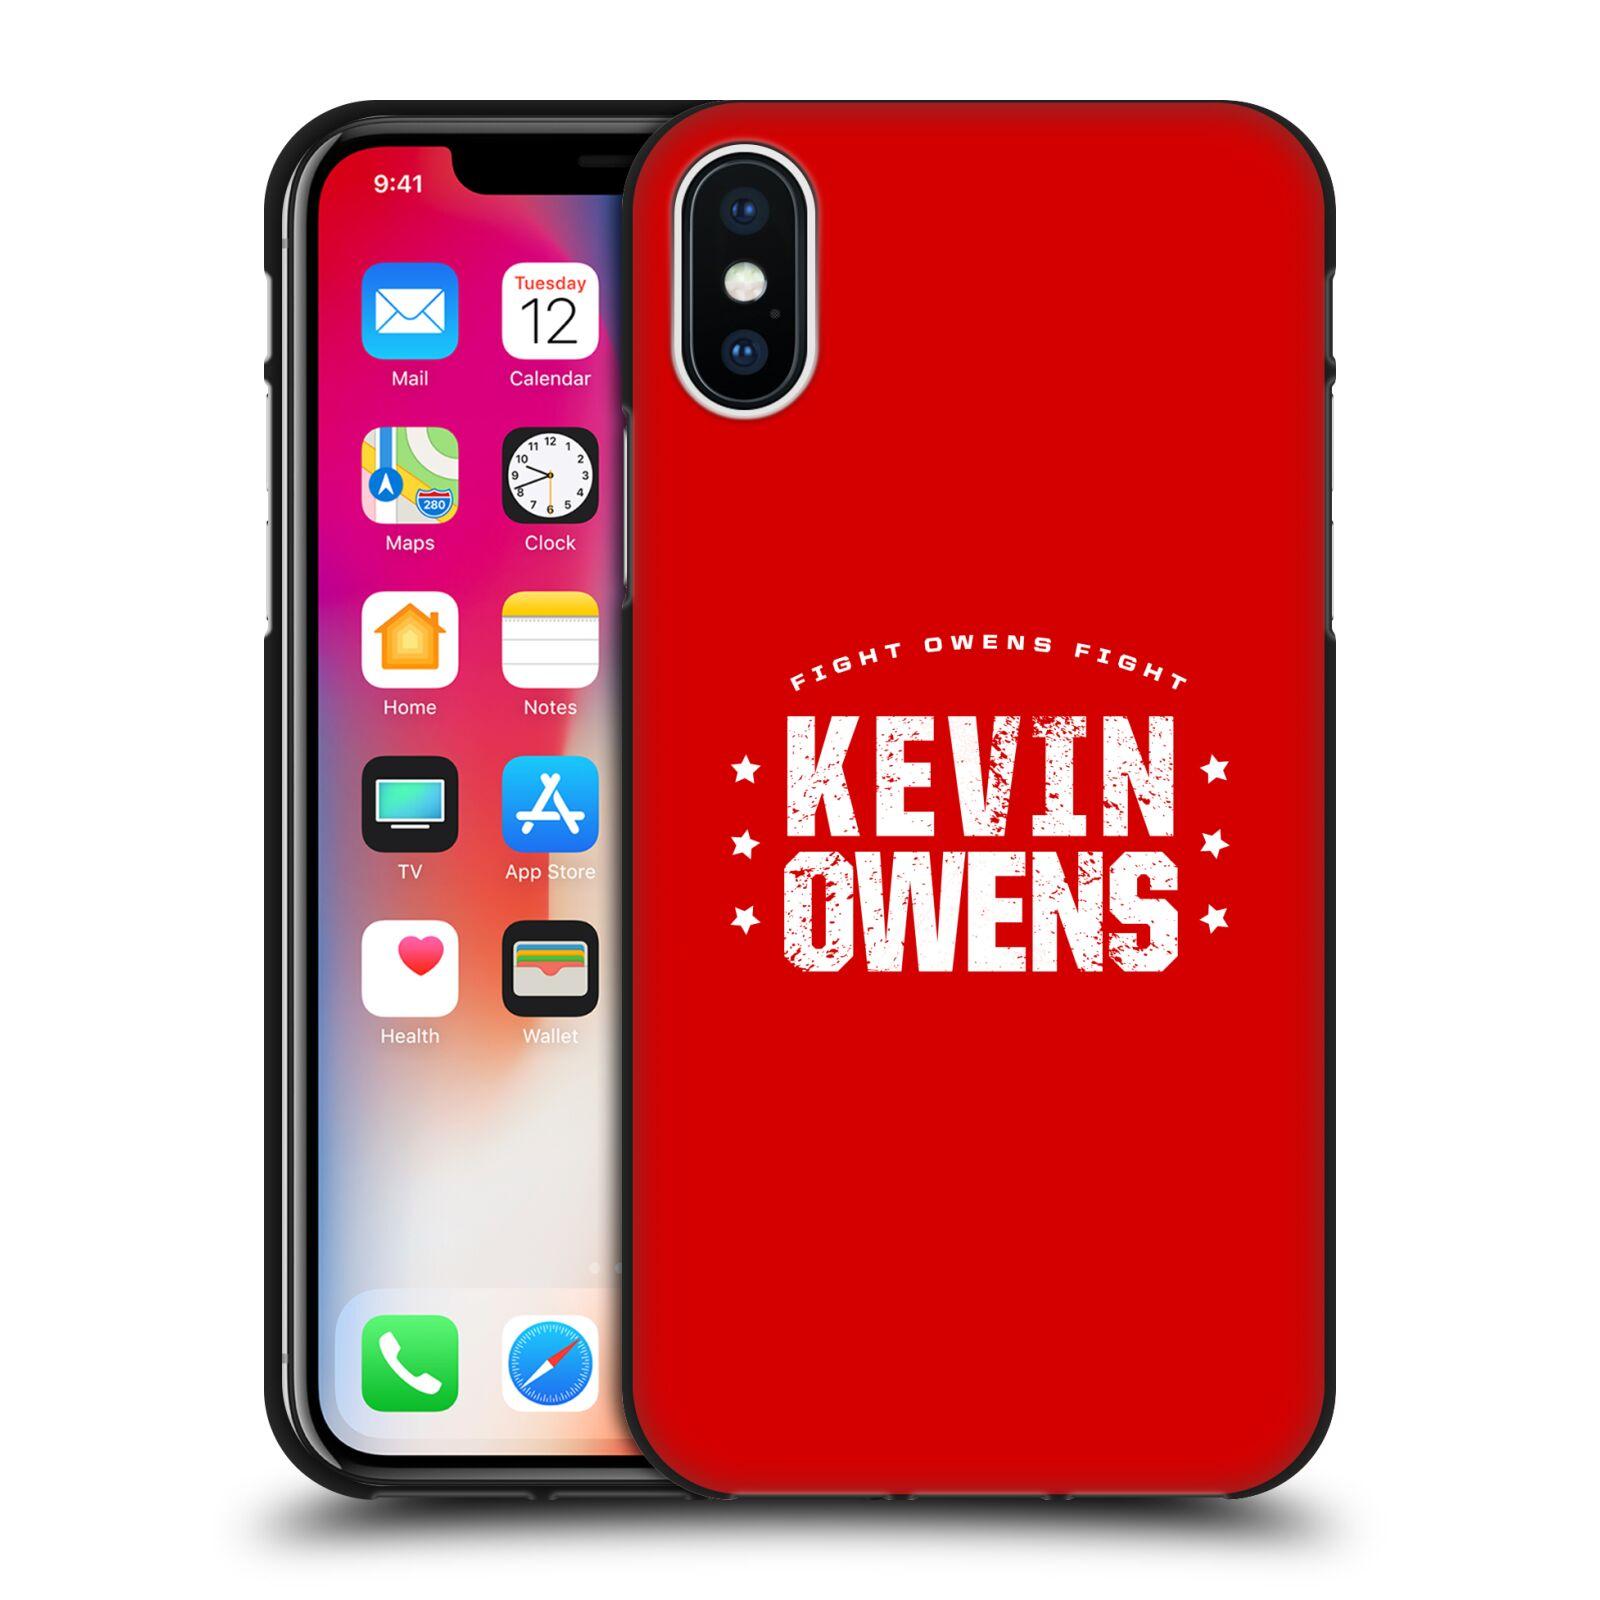 OFFICIAL-WWE-KEVIN-OWENS-BLACK-SOFT-GEL-CASE-FOR-APPLE-iPHONE-PHONES